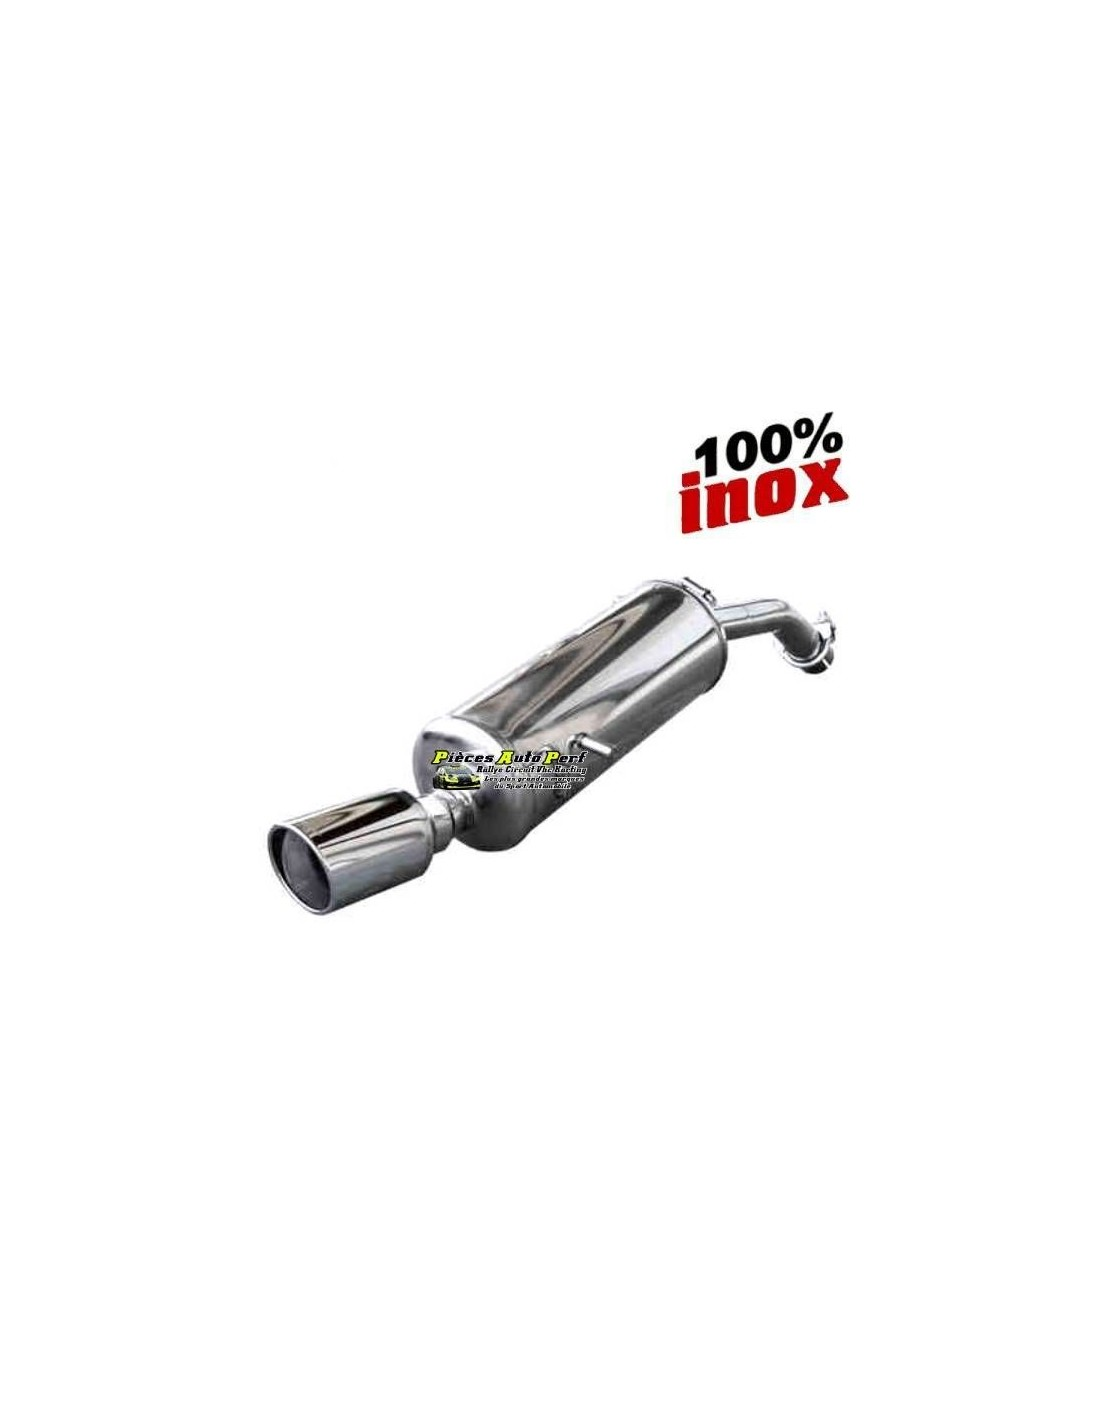 silencieux sportif inox simple sortie x race 90mm renault clio 1l8 16s. Black Bedroom Furniture Sets. Home Design Ideas